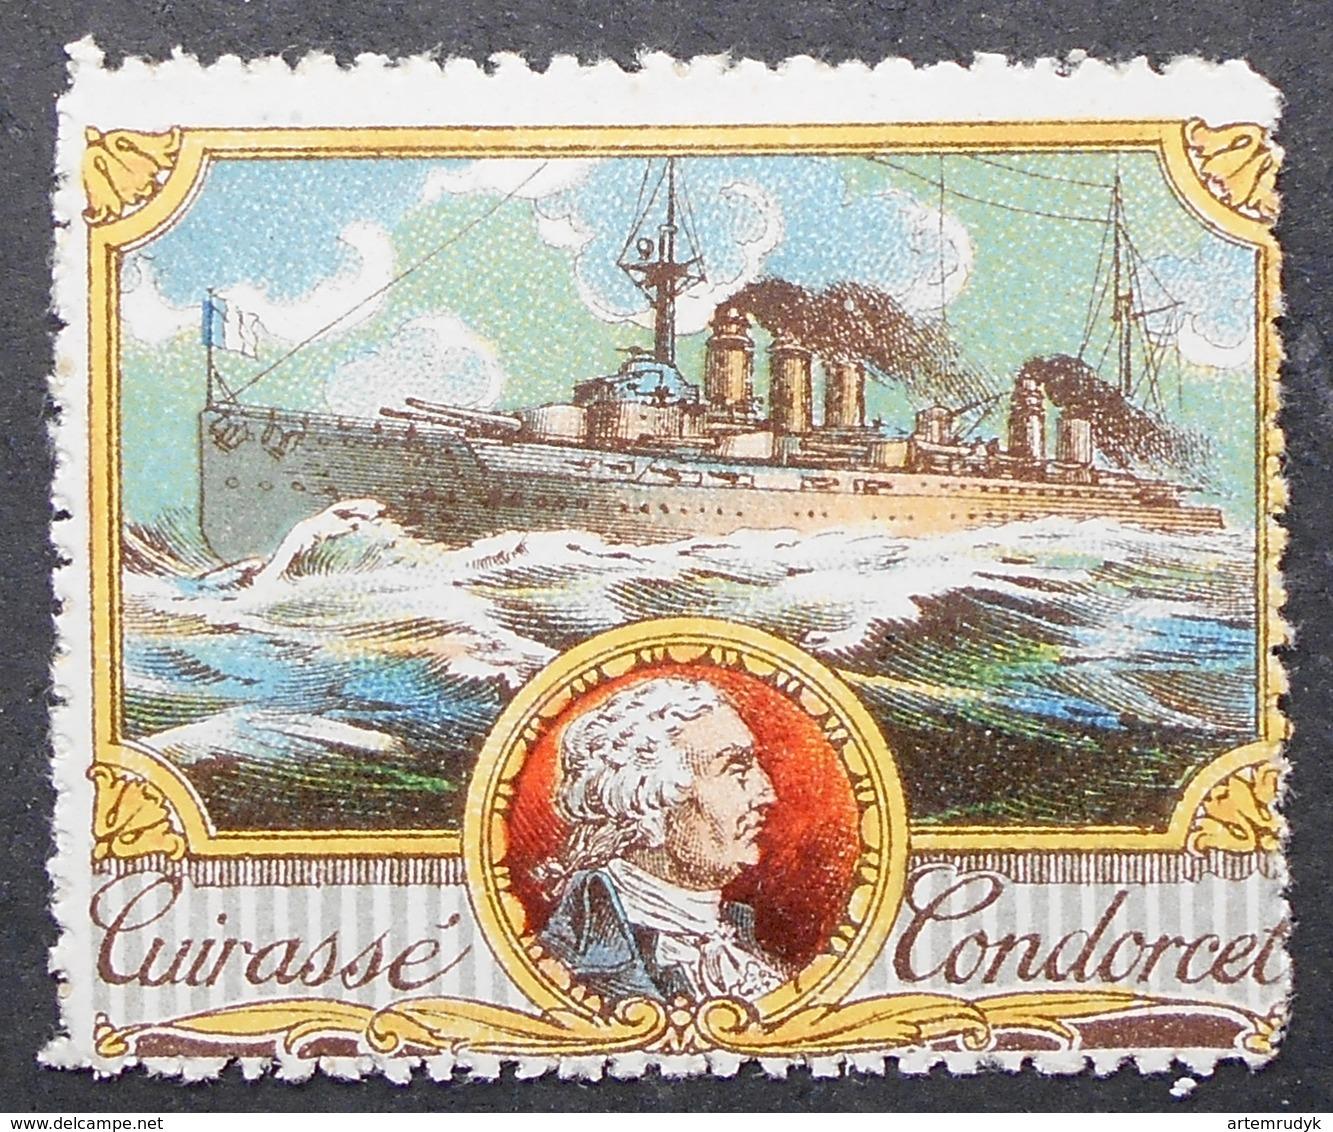 France Vignette Militaire Delandre Battleship Cuirasse Condorcet - Erinnofilie